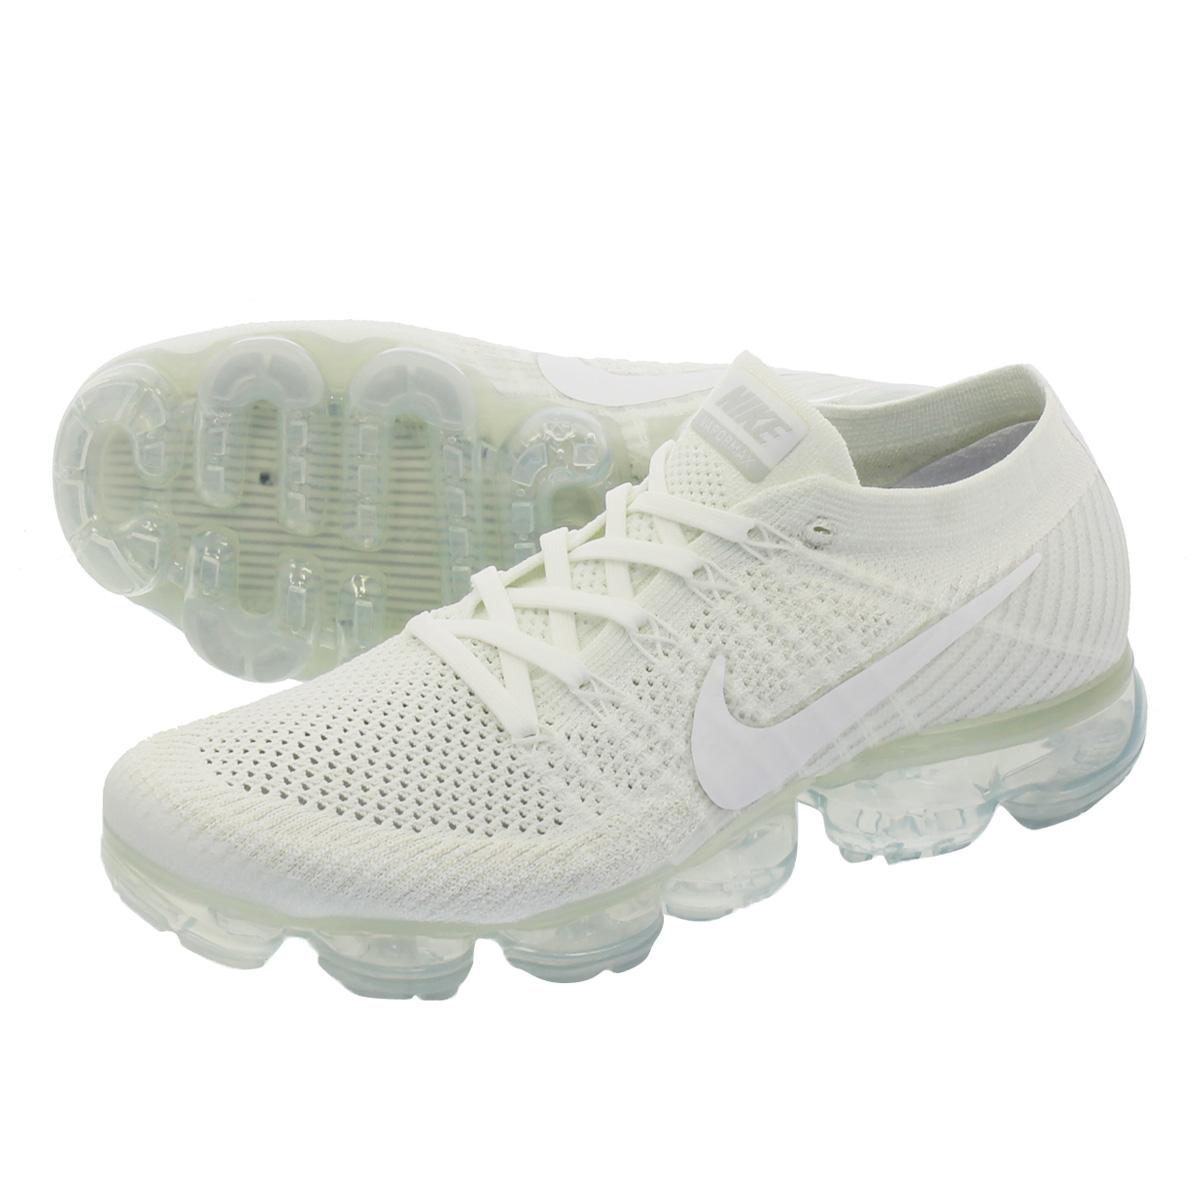 e66f5735f7414 NIKE AIR VAPORMAX FLYKNIT Nike vapor max fried food knit WHITE WHITE SAIL LIGHT  BONE